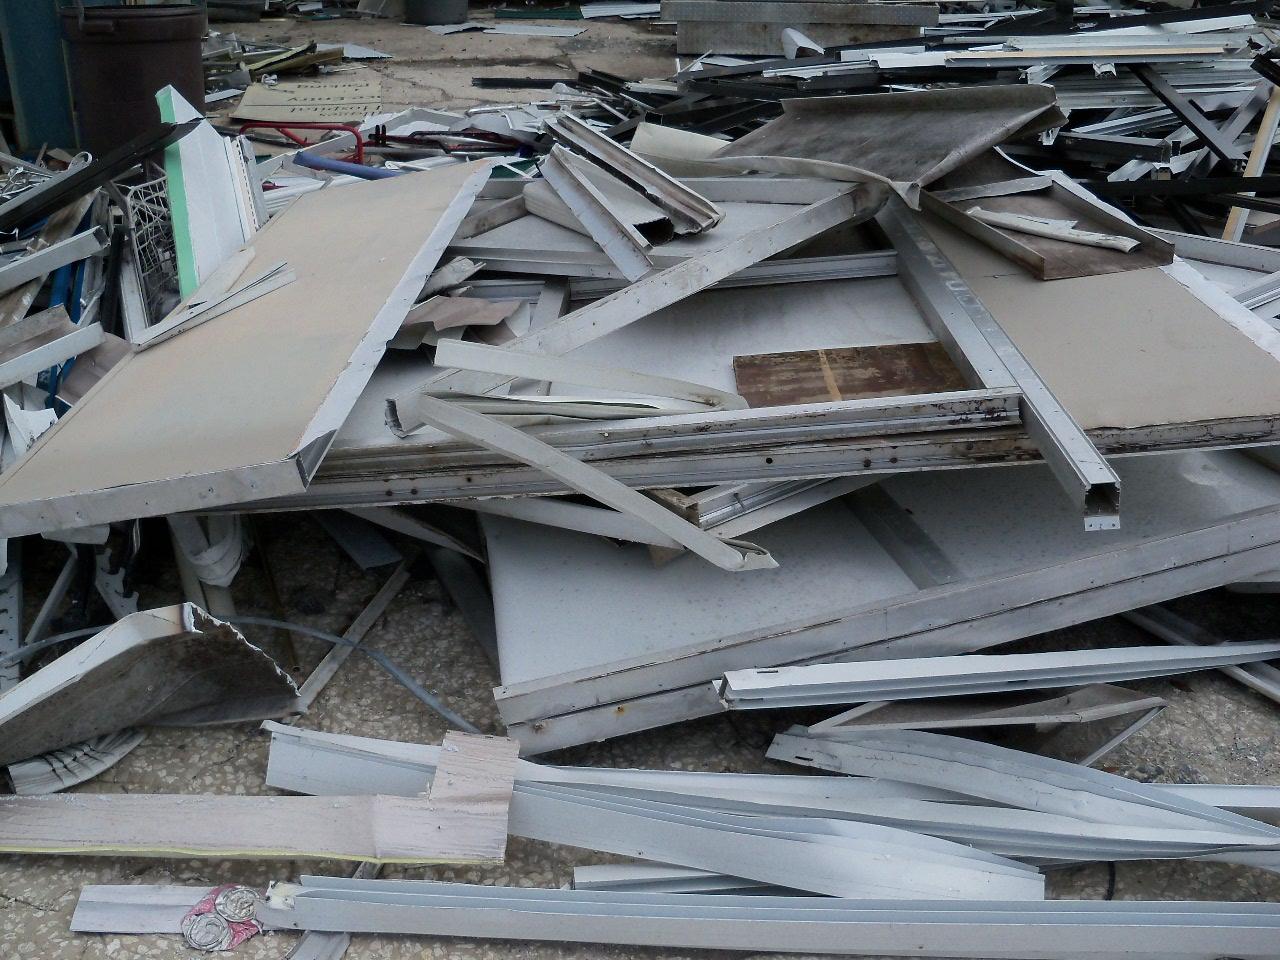 Aluminum siding pile